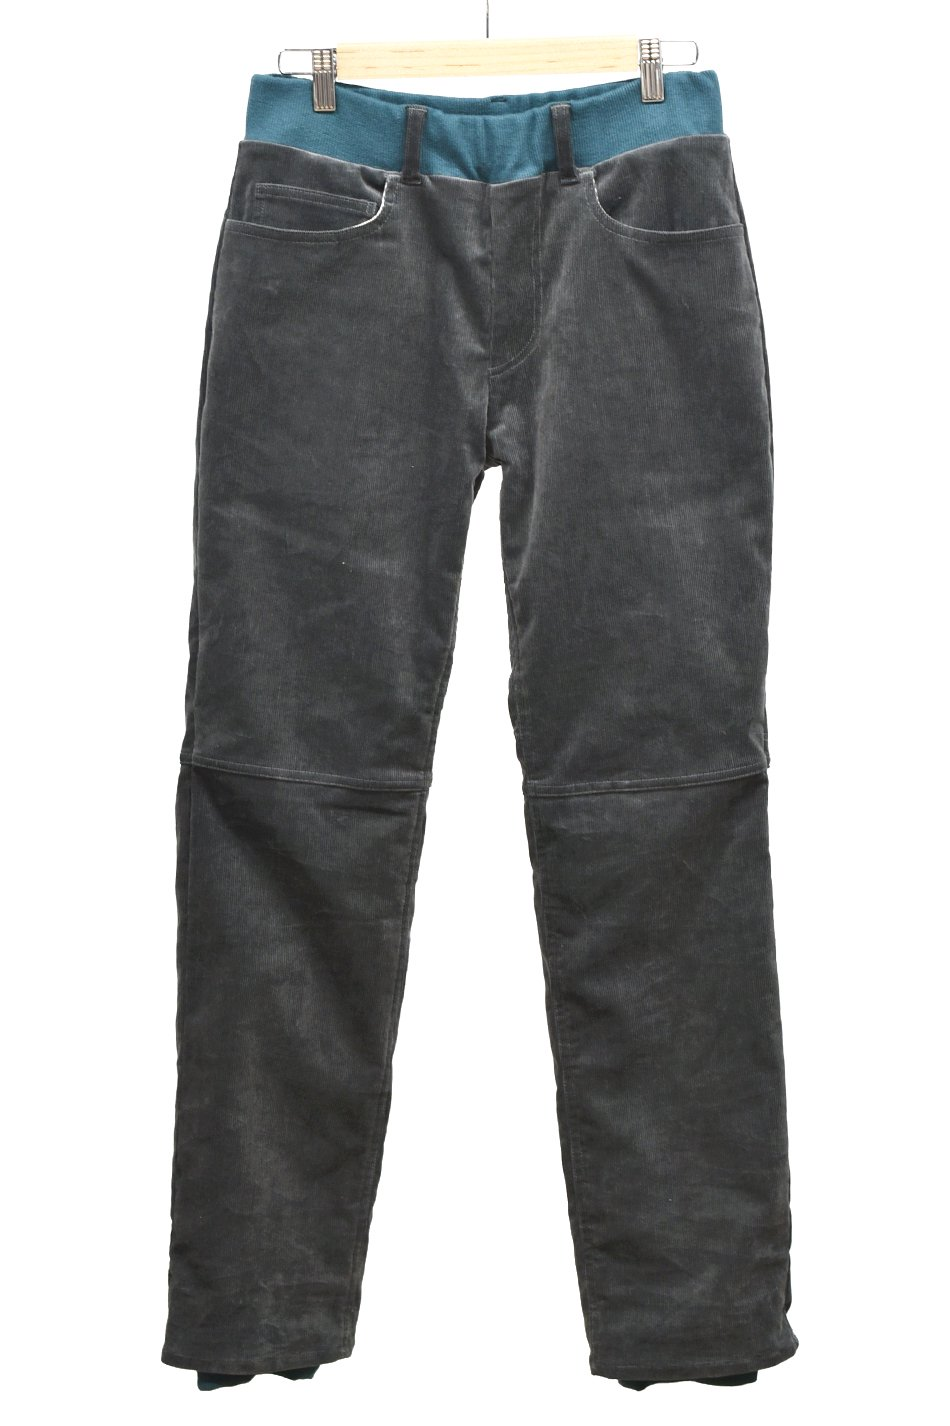 20%off! ARIGATO FAKKYU - アリガトファッキュ 5 POCKET - SWEAT PANTS